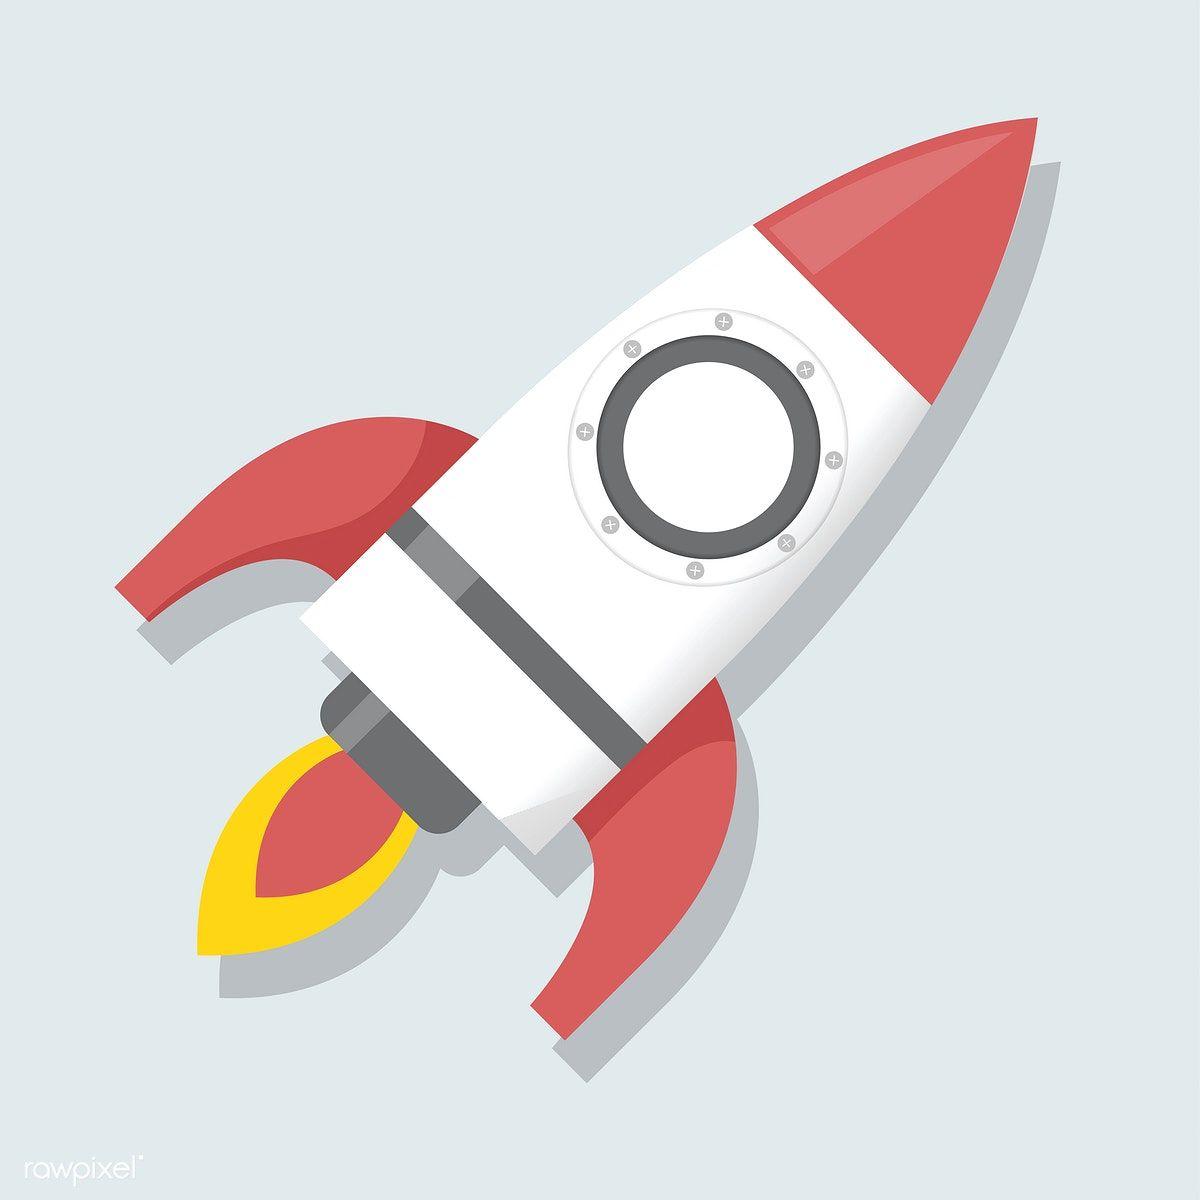 Download Premium Vector Of Illustration Of Rocket Icon 747 Stock Images Free Free Vector Illustration Illustration